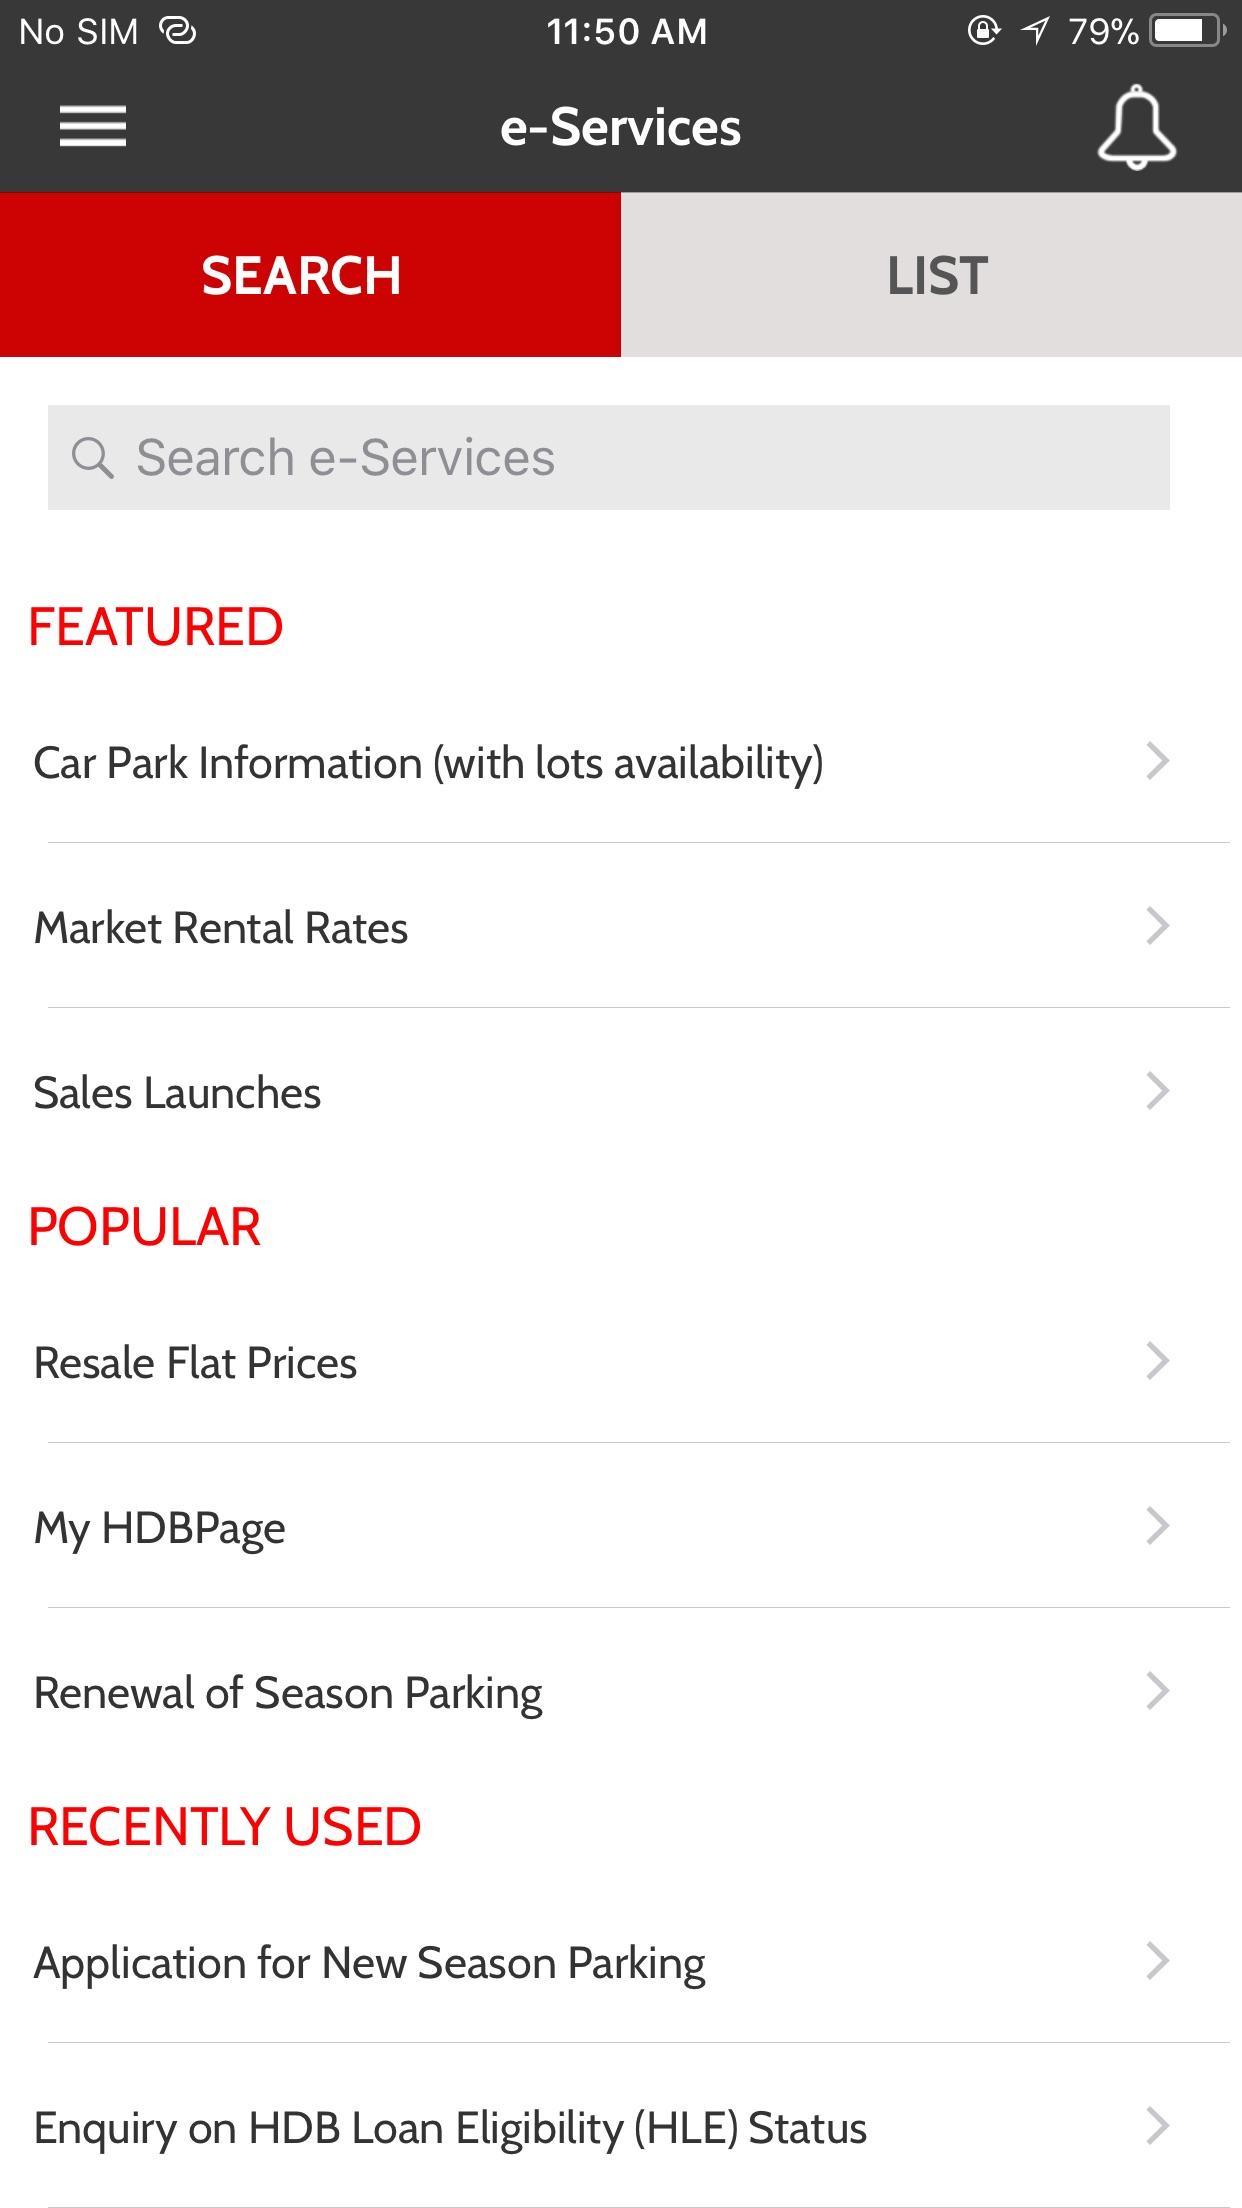 Mobile@HDB Screenshot